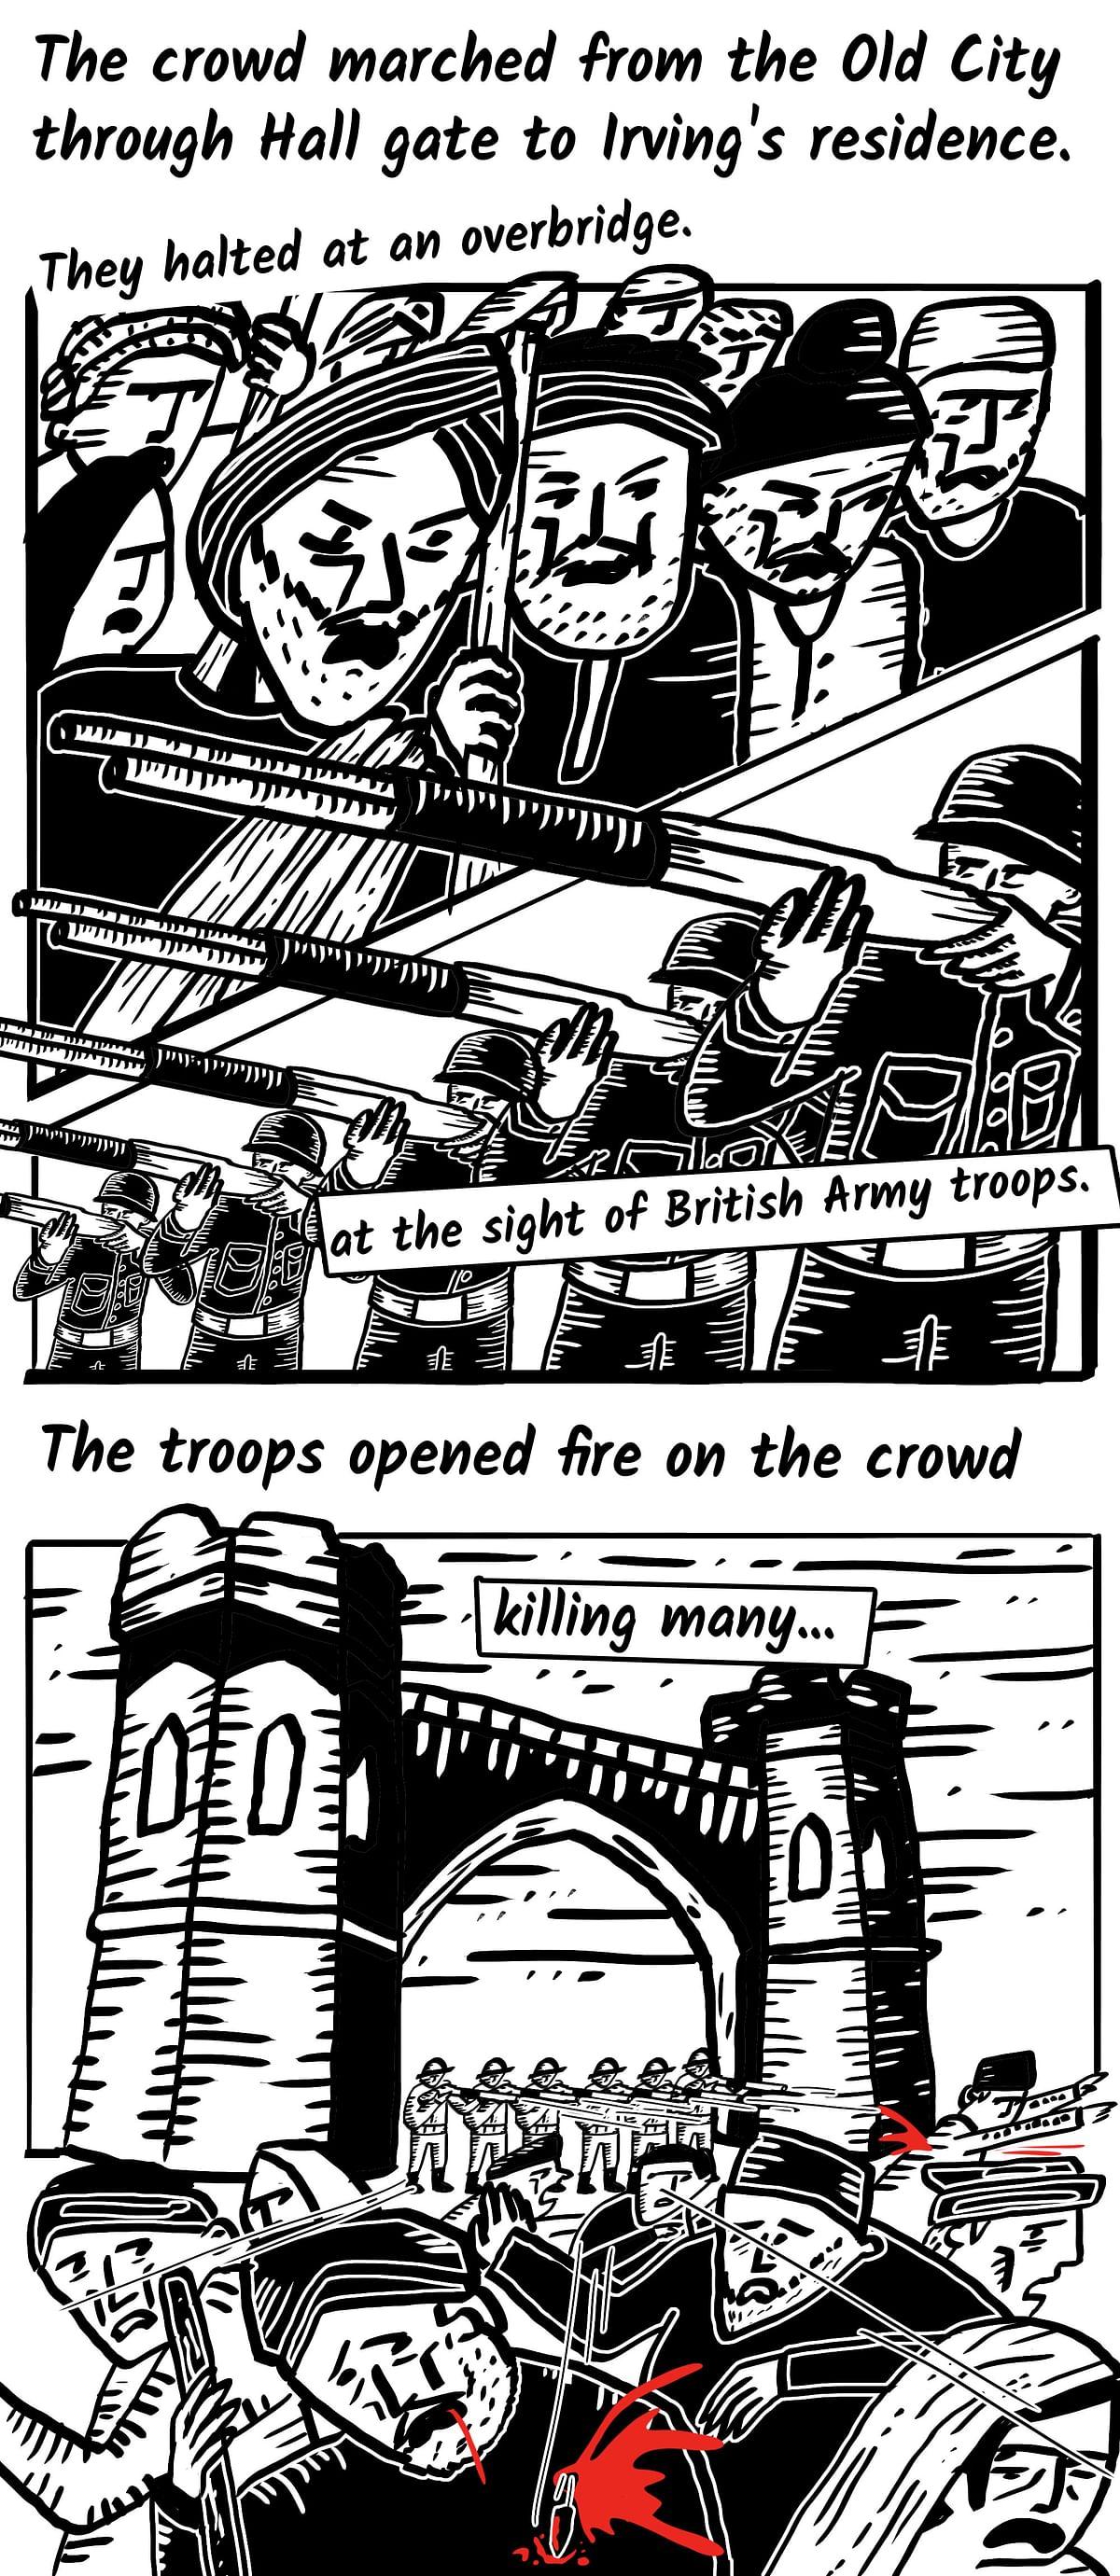 Graphic Novel: Revisiting Jallianwala Bagh Massacre, 102 Yrs Later